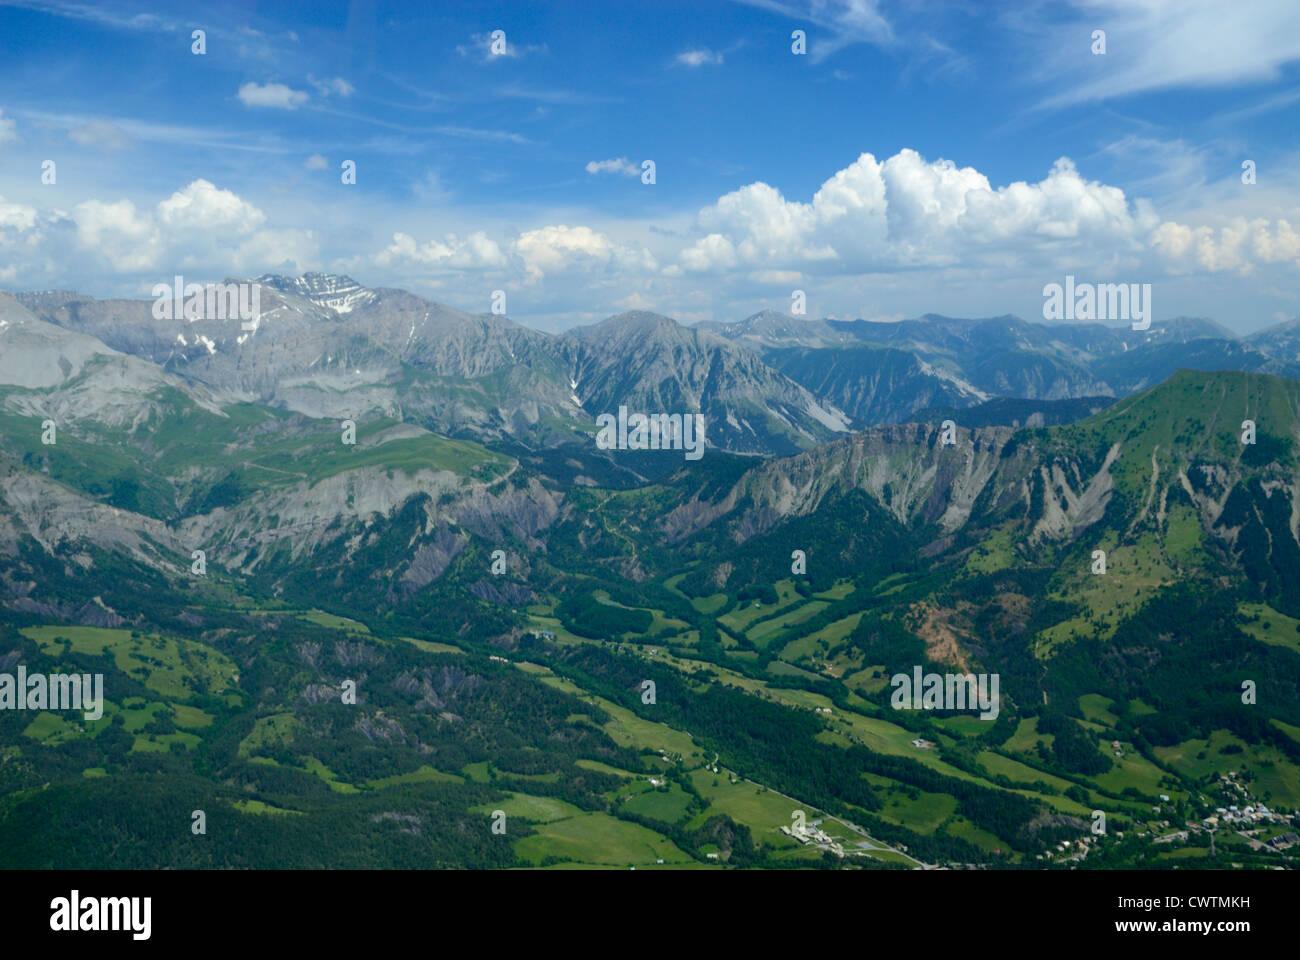 Valle di Bes a Le Vernet, torna a sinistra tete de l'Estrop picco destro e Montagne de l'Ubac, Alpes de Immagini Stock